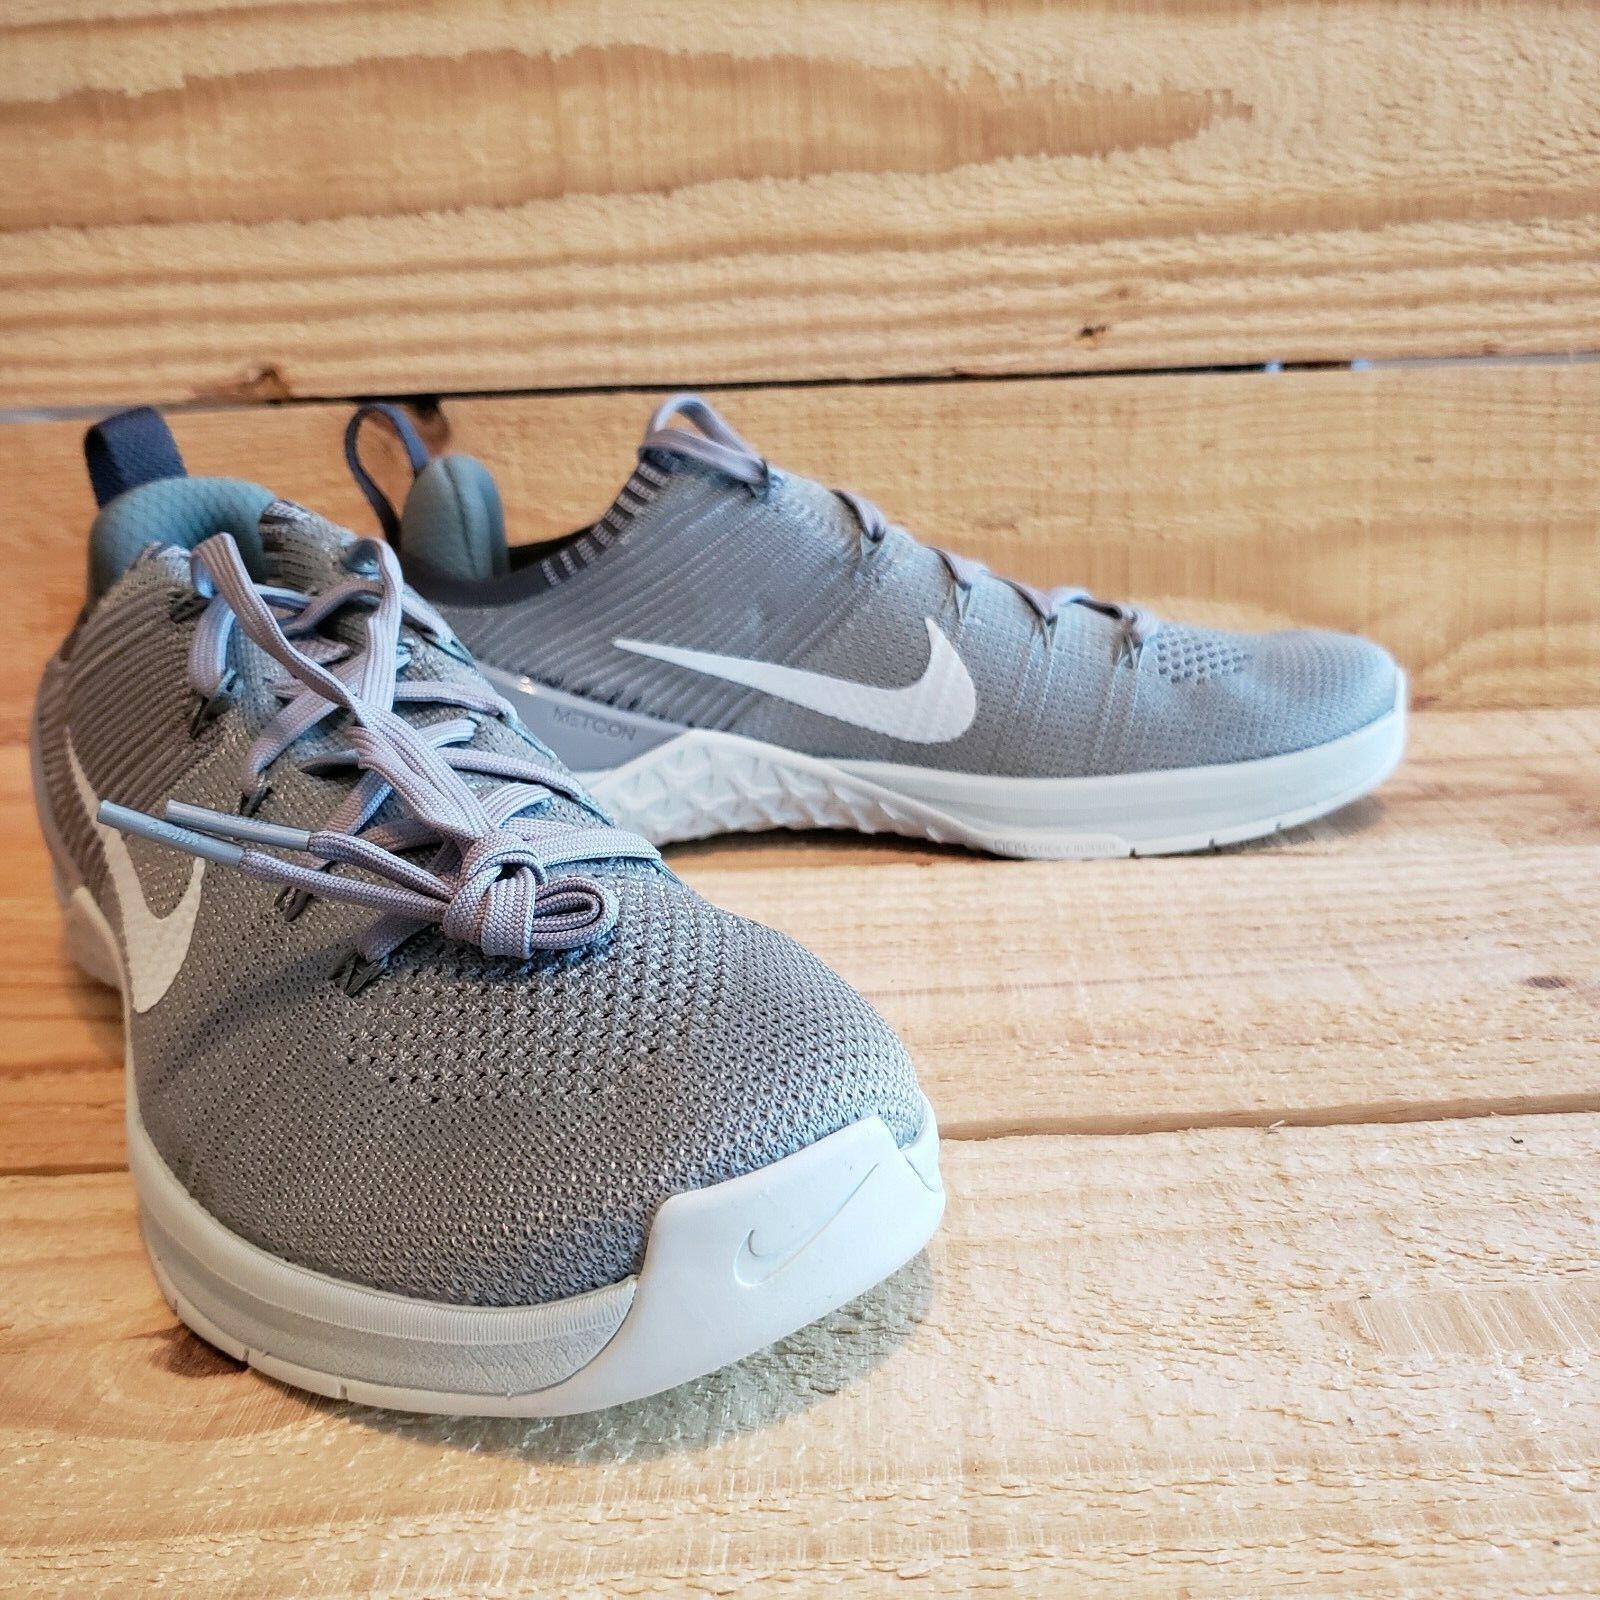 Nike Metcon DSX  924595-004 Flyknit 2 Cross Training Womens shoes Size Grey